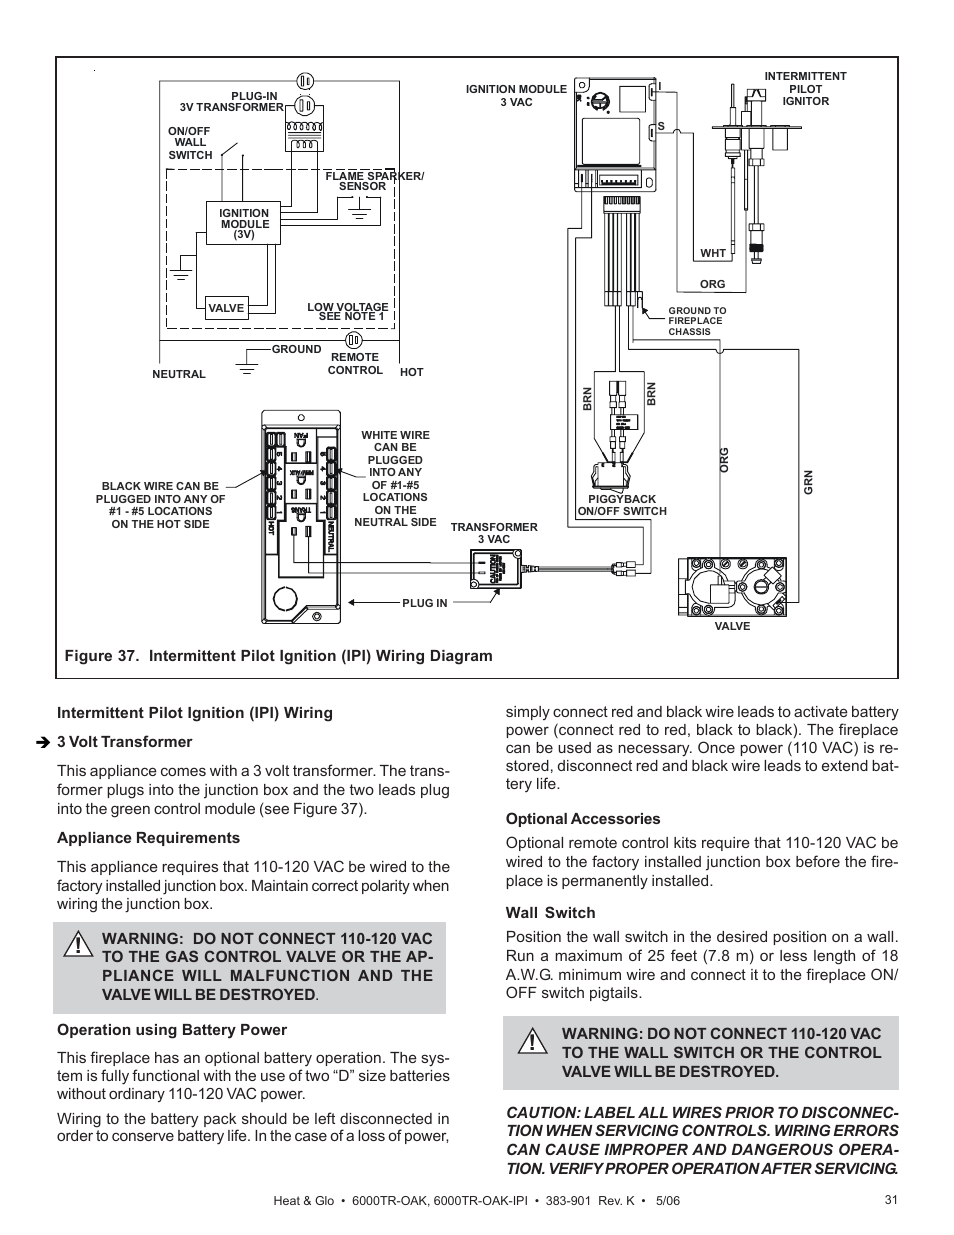 medium resolution of heat glo fireplace 6000tr oak user manual page 27 31 also for 6000tr oak ipi